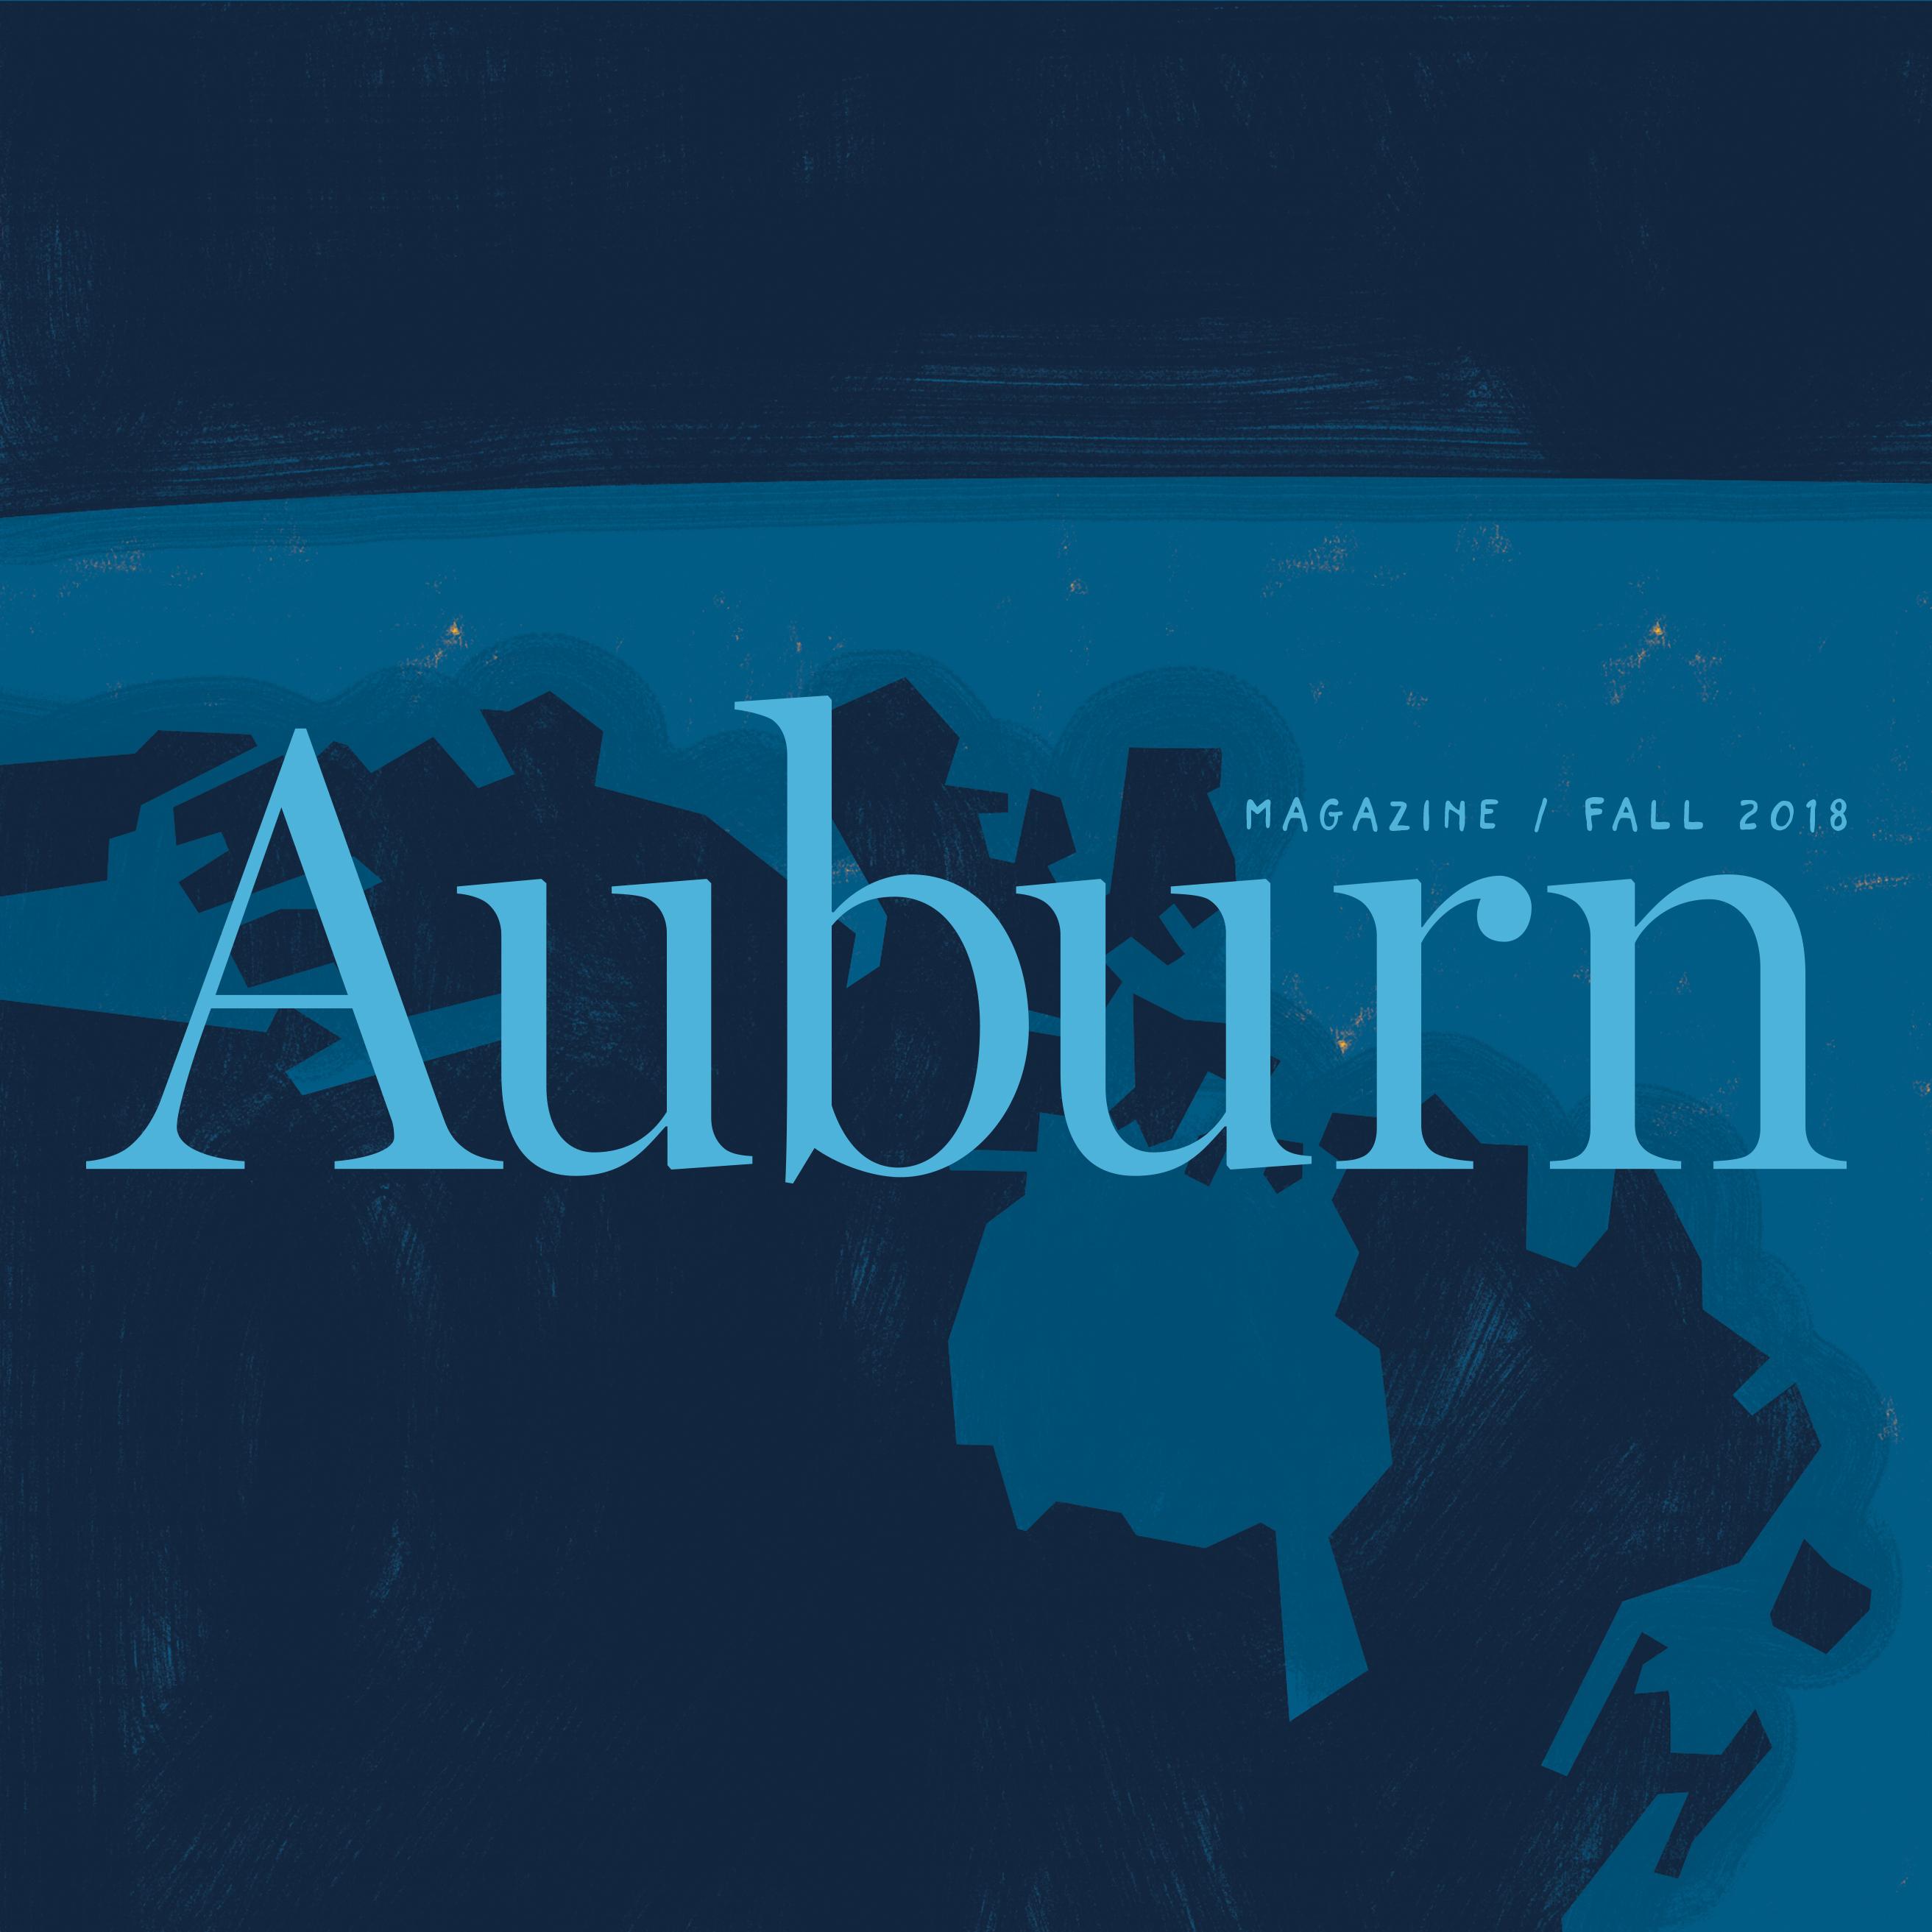 Auburn Magazine / Fall 2018